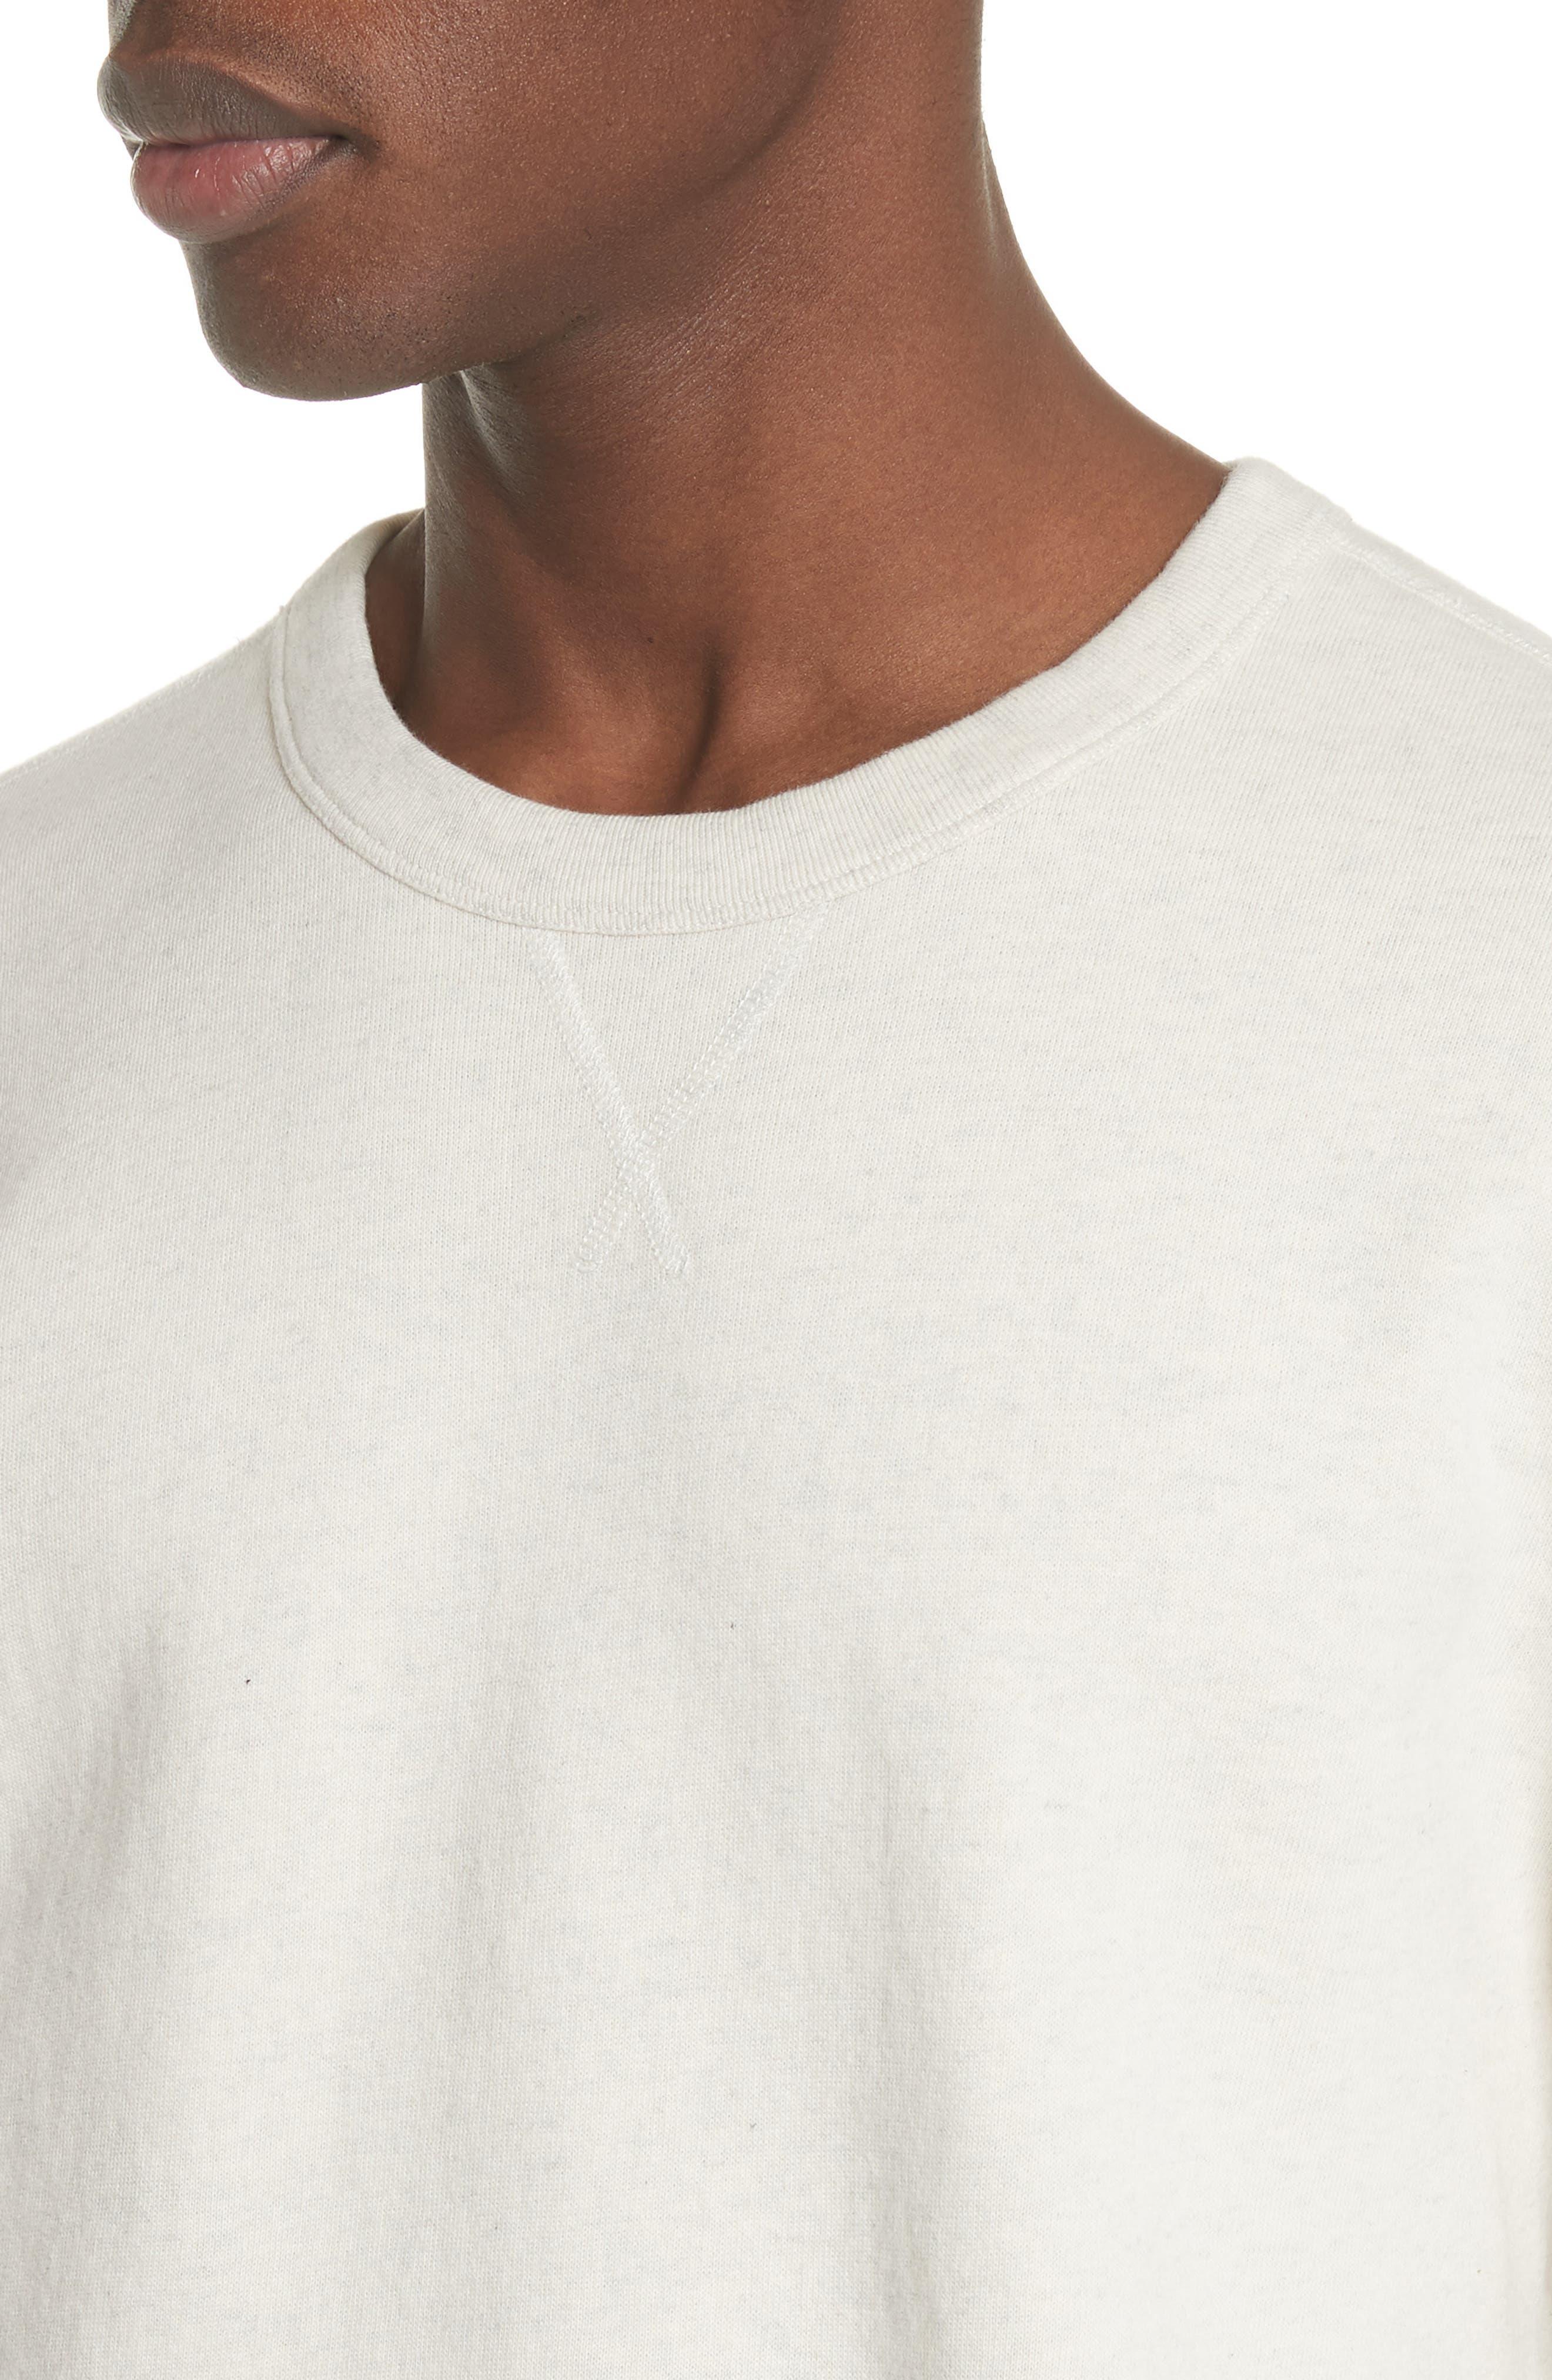 Crewneck Sweatshirt,                             Alternate thumbnail 4, color,                             050